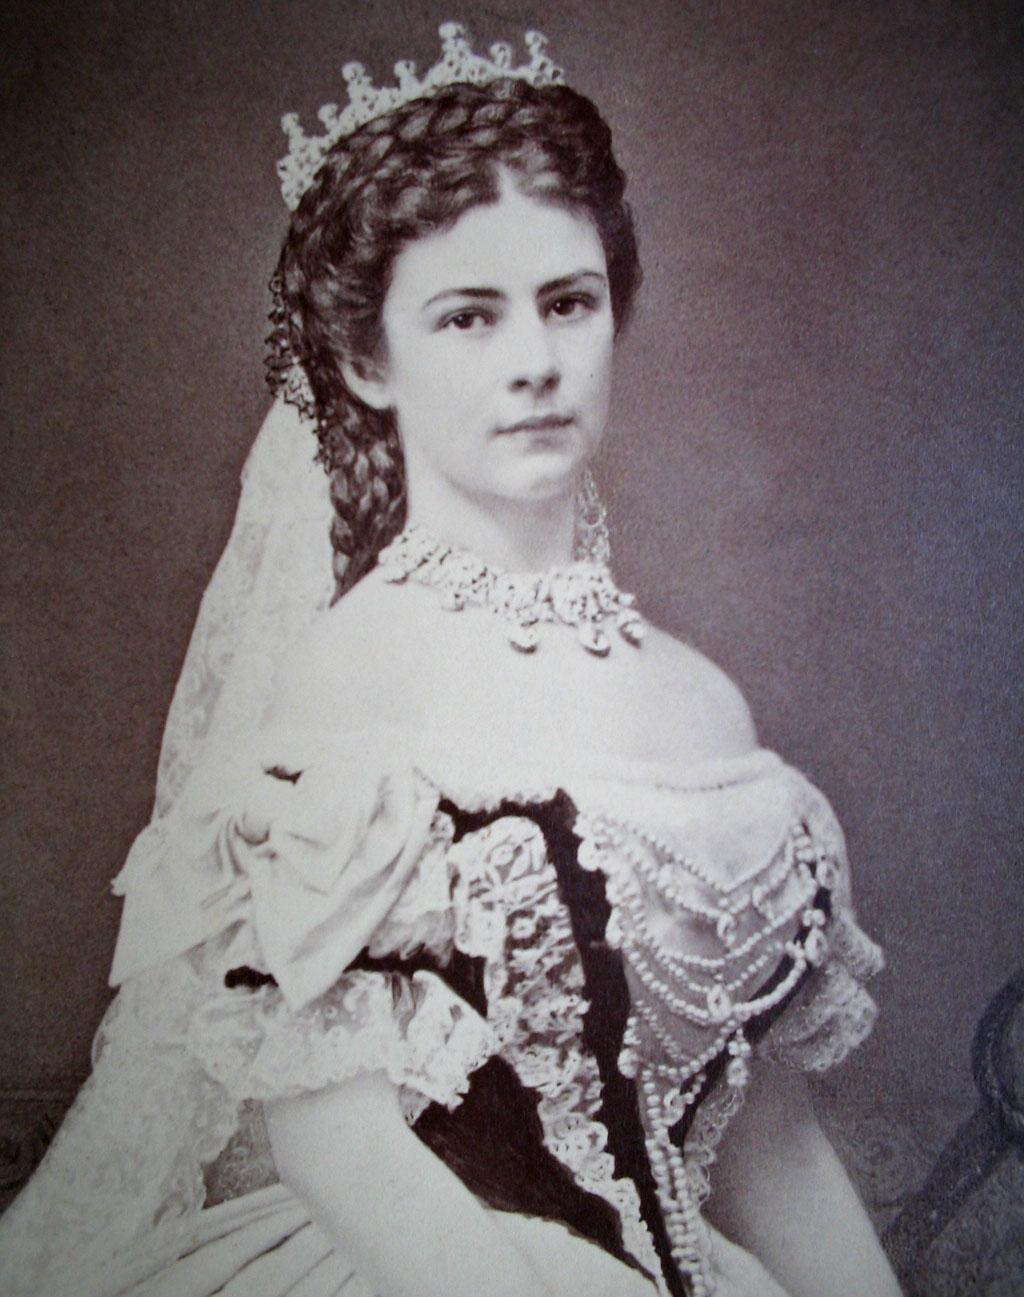 https://upload.wikimedia.org/wikipedia/commons/4/47/Elisabeth-%C3%96sterreich-1867.jpg